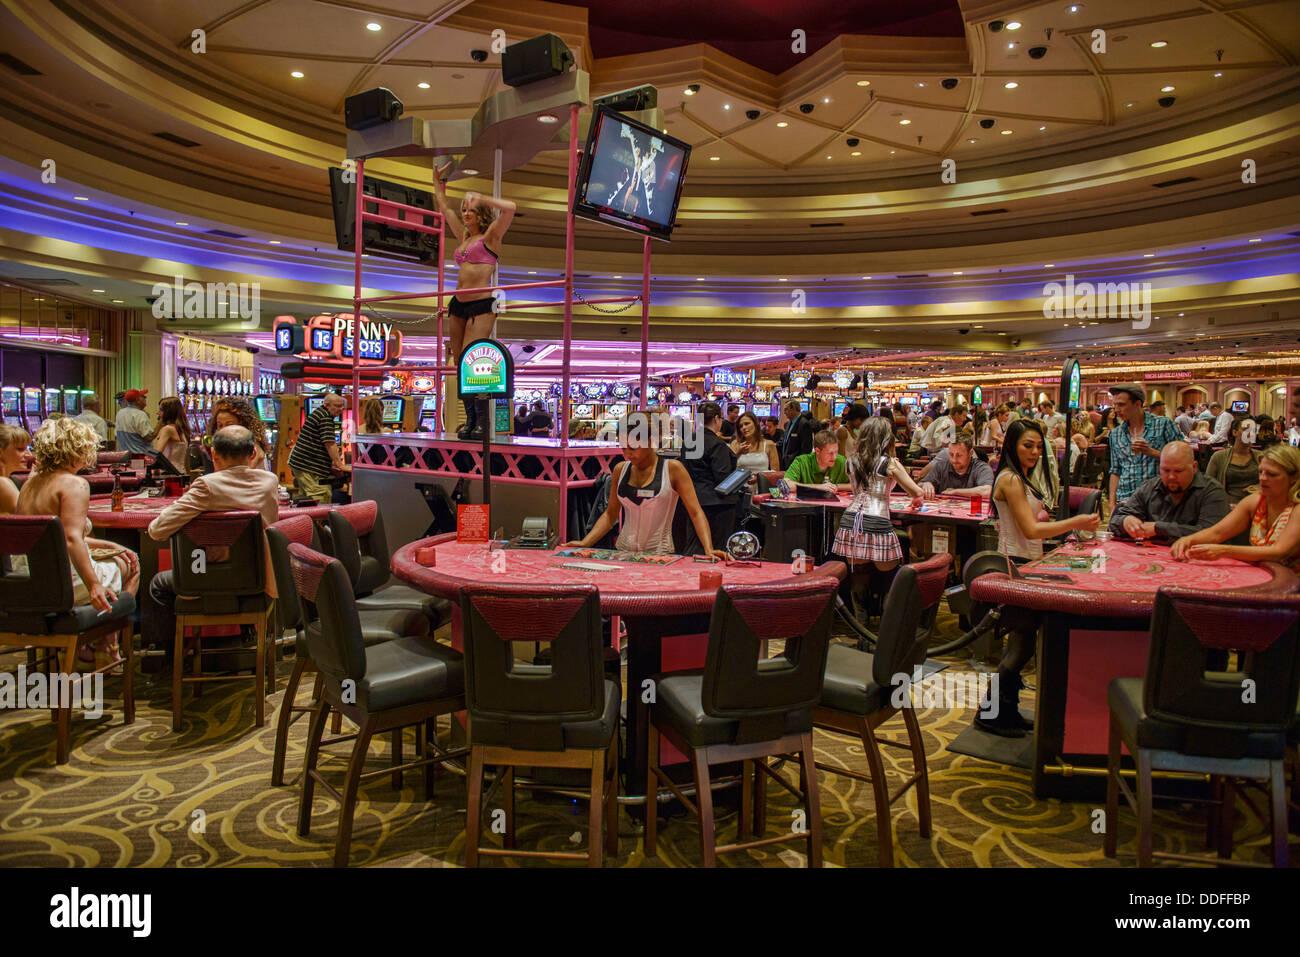 Kennel club poker hours